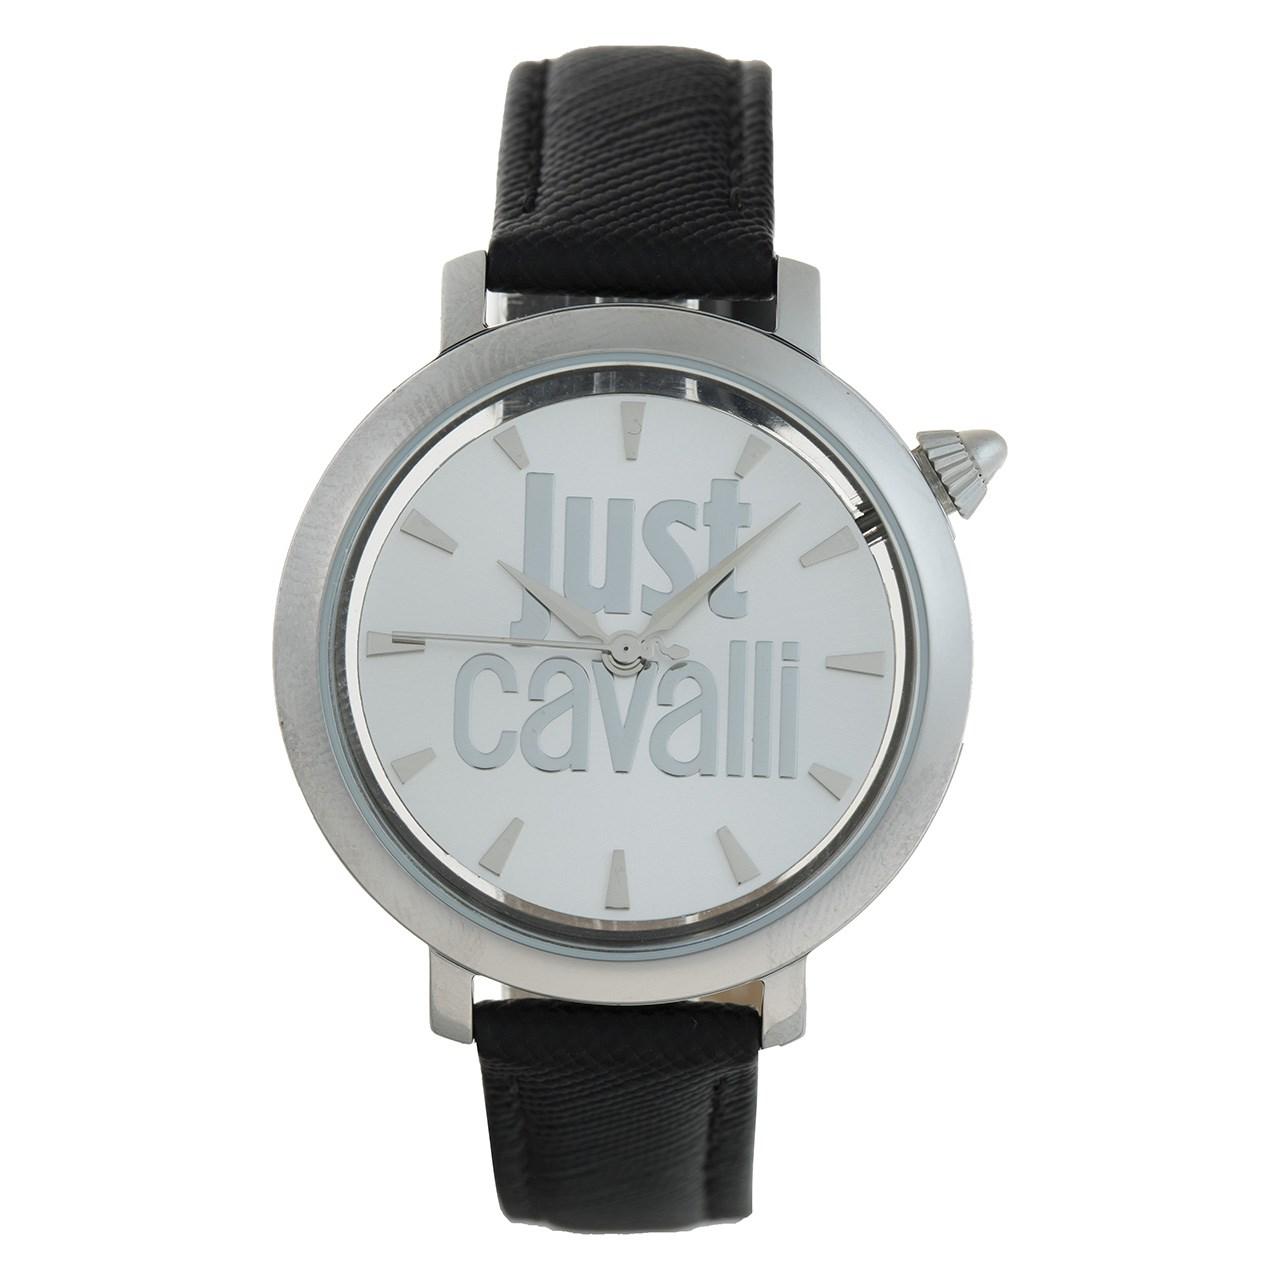 ساعت  زنانه جاست کاوالی مدل JC1L007L0015